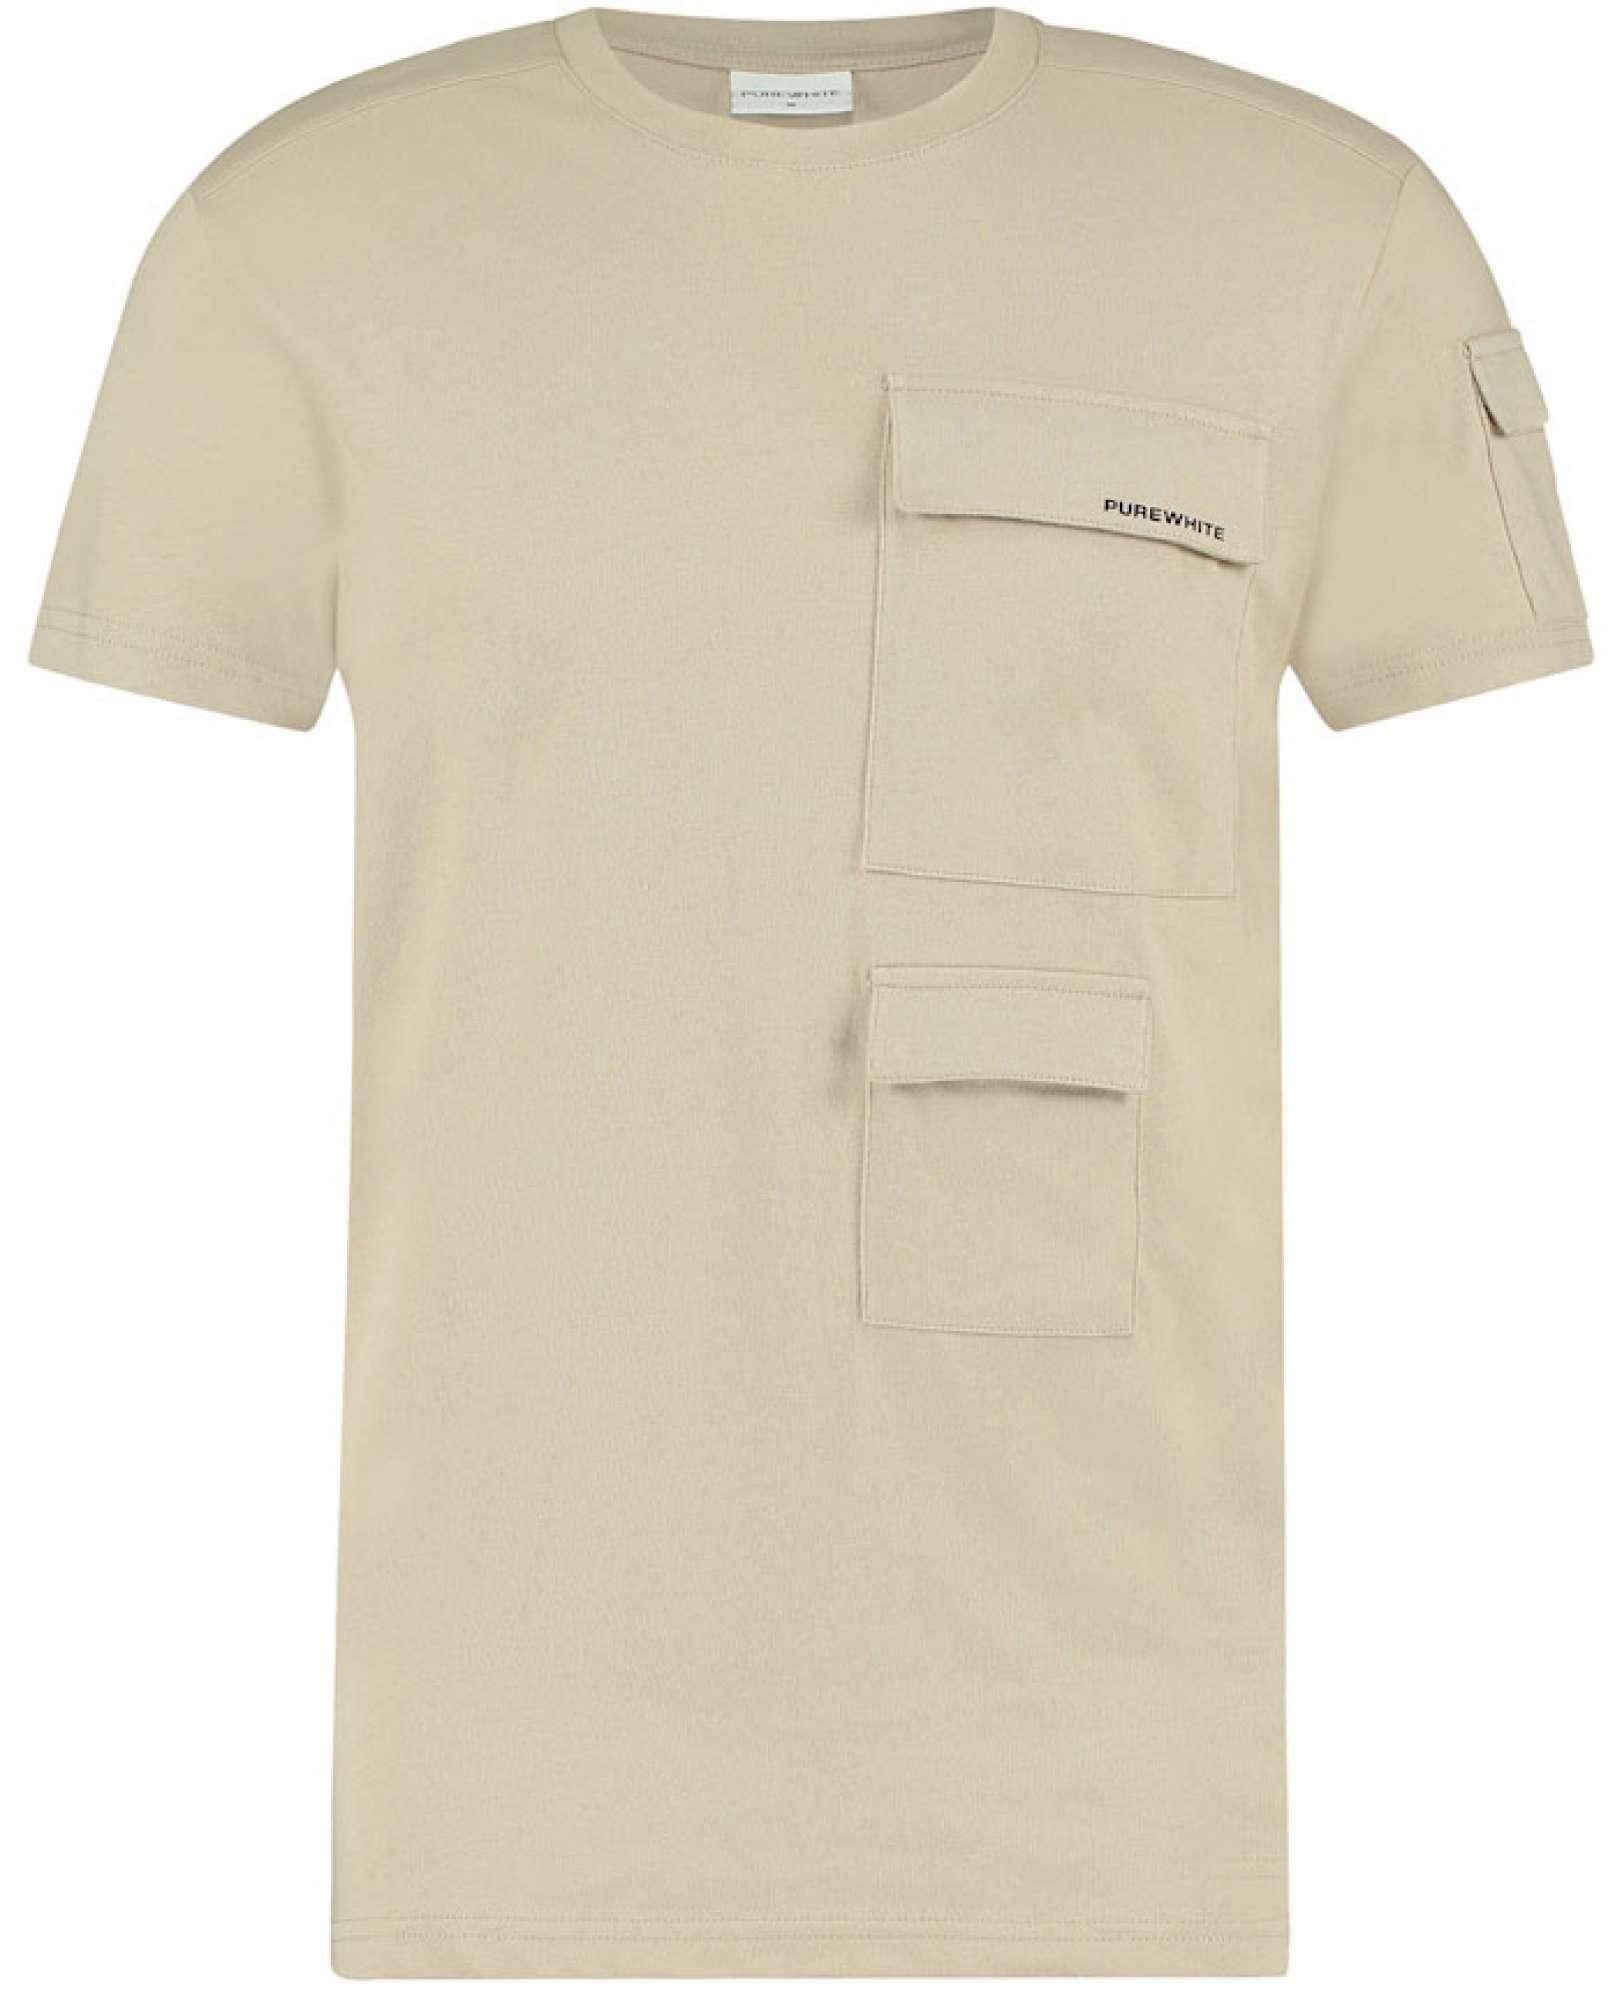 T-shirt 3 pockets sand